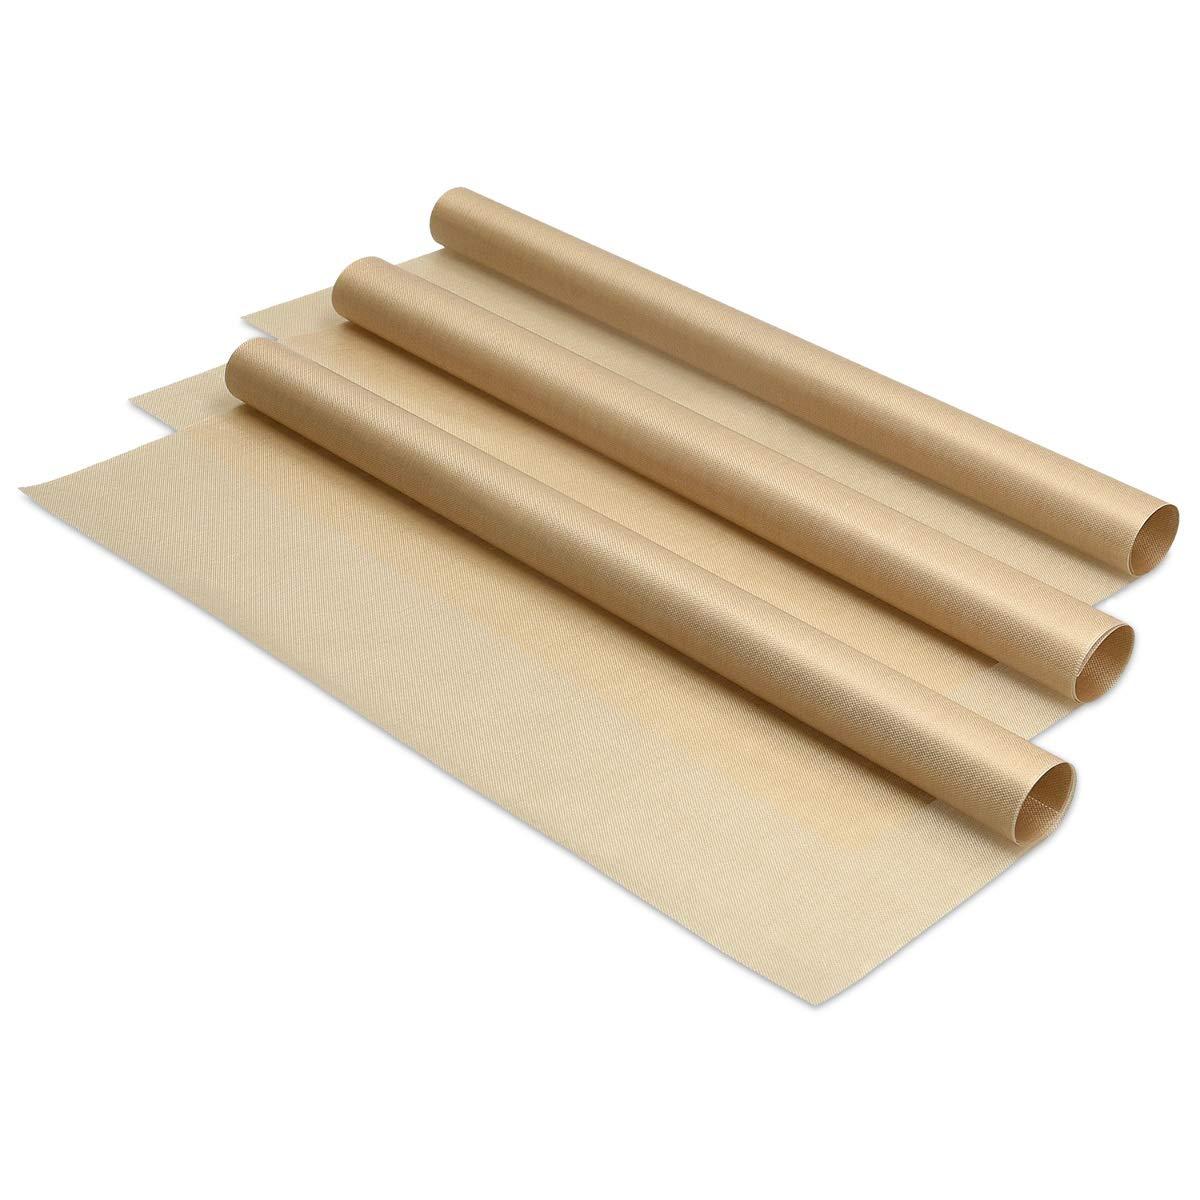 Navaris 3x Reusable Baking Sheets - 33x40cm Parchment Paper for Baking Oven - Durable Non-Stick Baking Mats - Reversible Baking Tray - Set of 3 Pieces